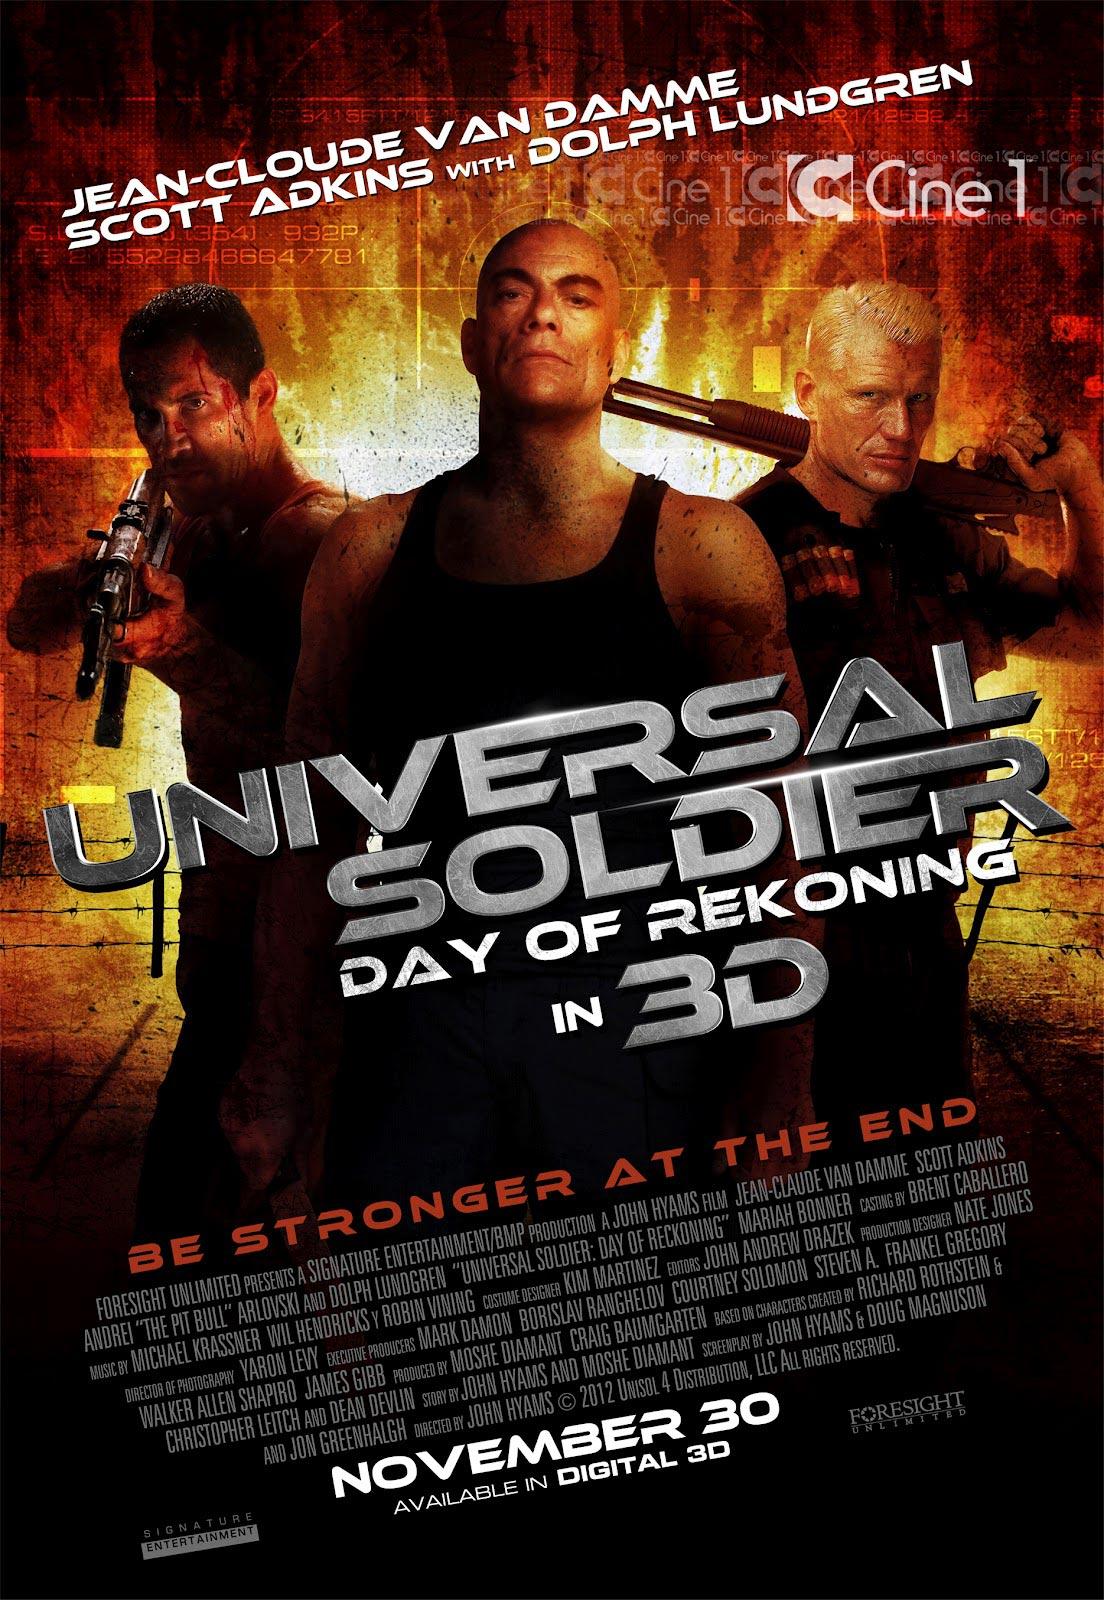 http://2.bp.blogspot.com/-yQeh3ligdgQ/UJVkLwq3gCI/AAAAAAAAAiE/FquMan2SU80/s1600/Universal-Soldier-4-1.jpg